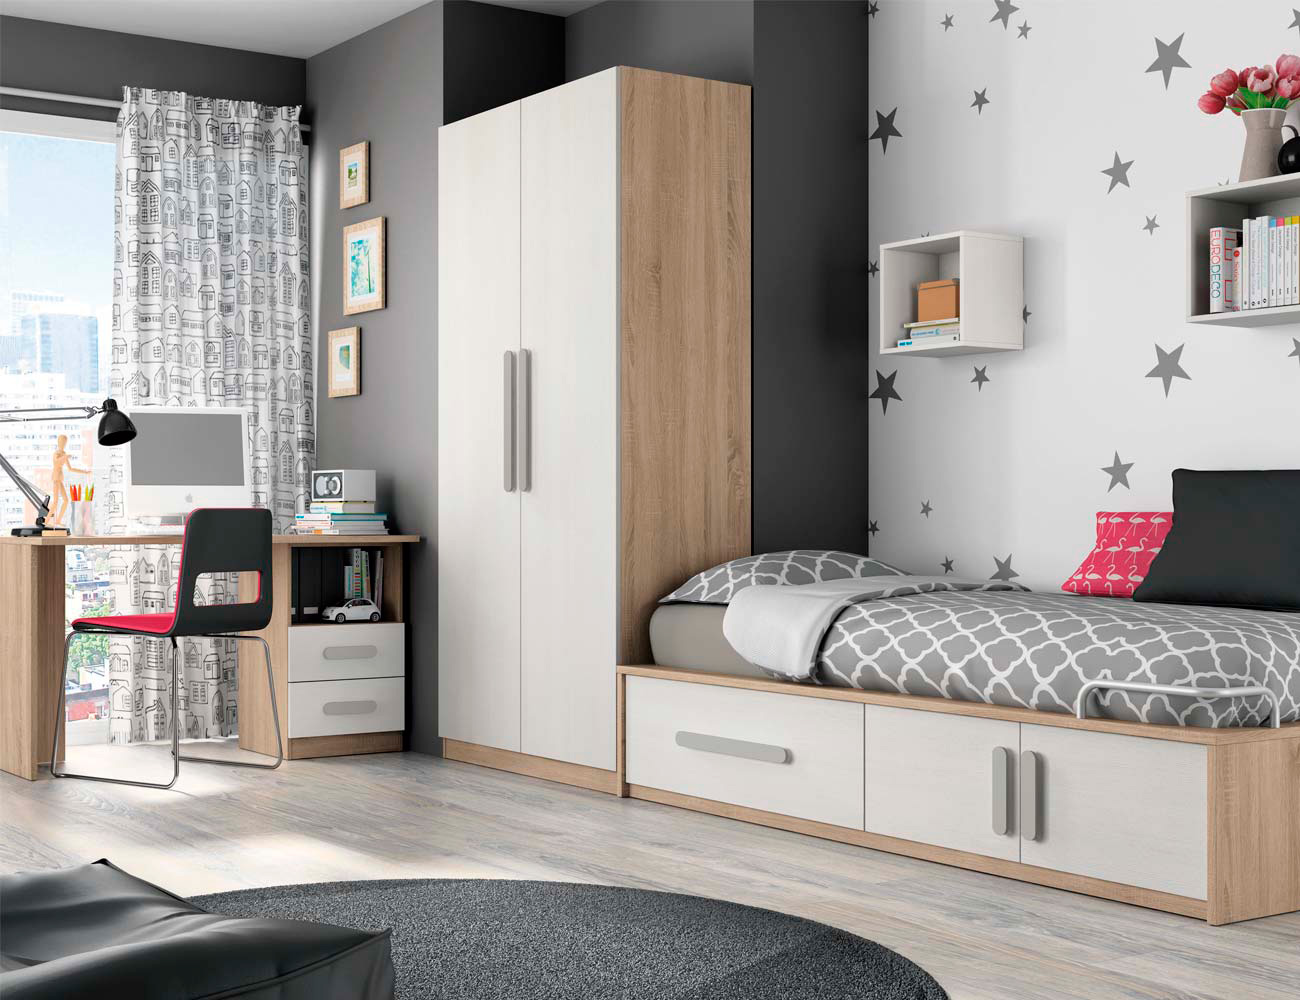 Composicion 301 dormitorio juvenil cambrian blanco